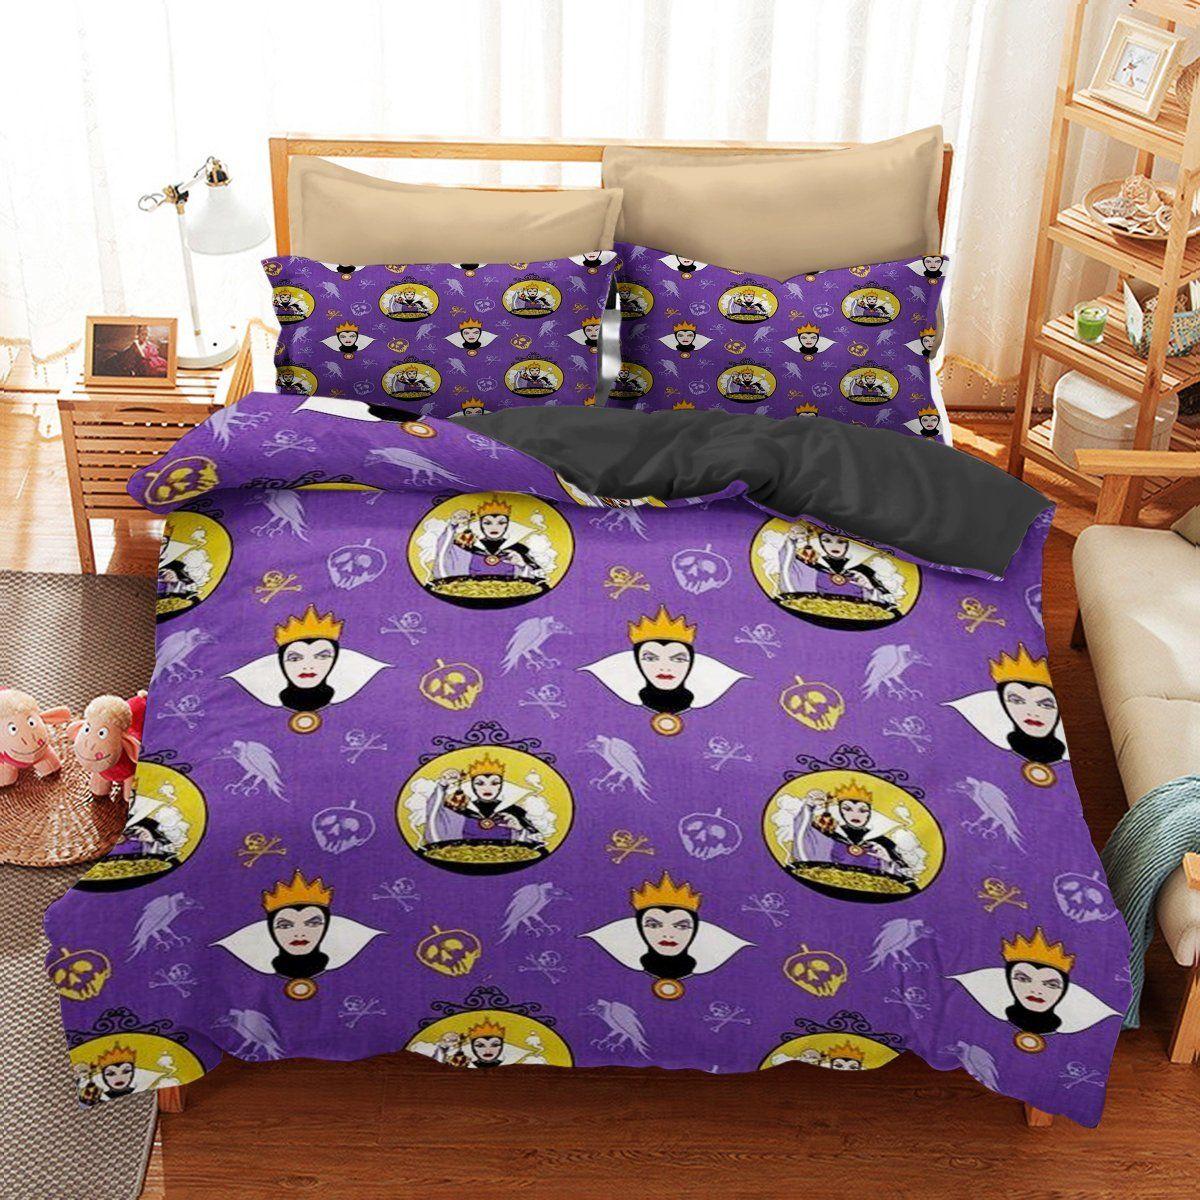 Bedding set villains funny gift idea